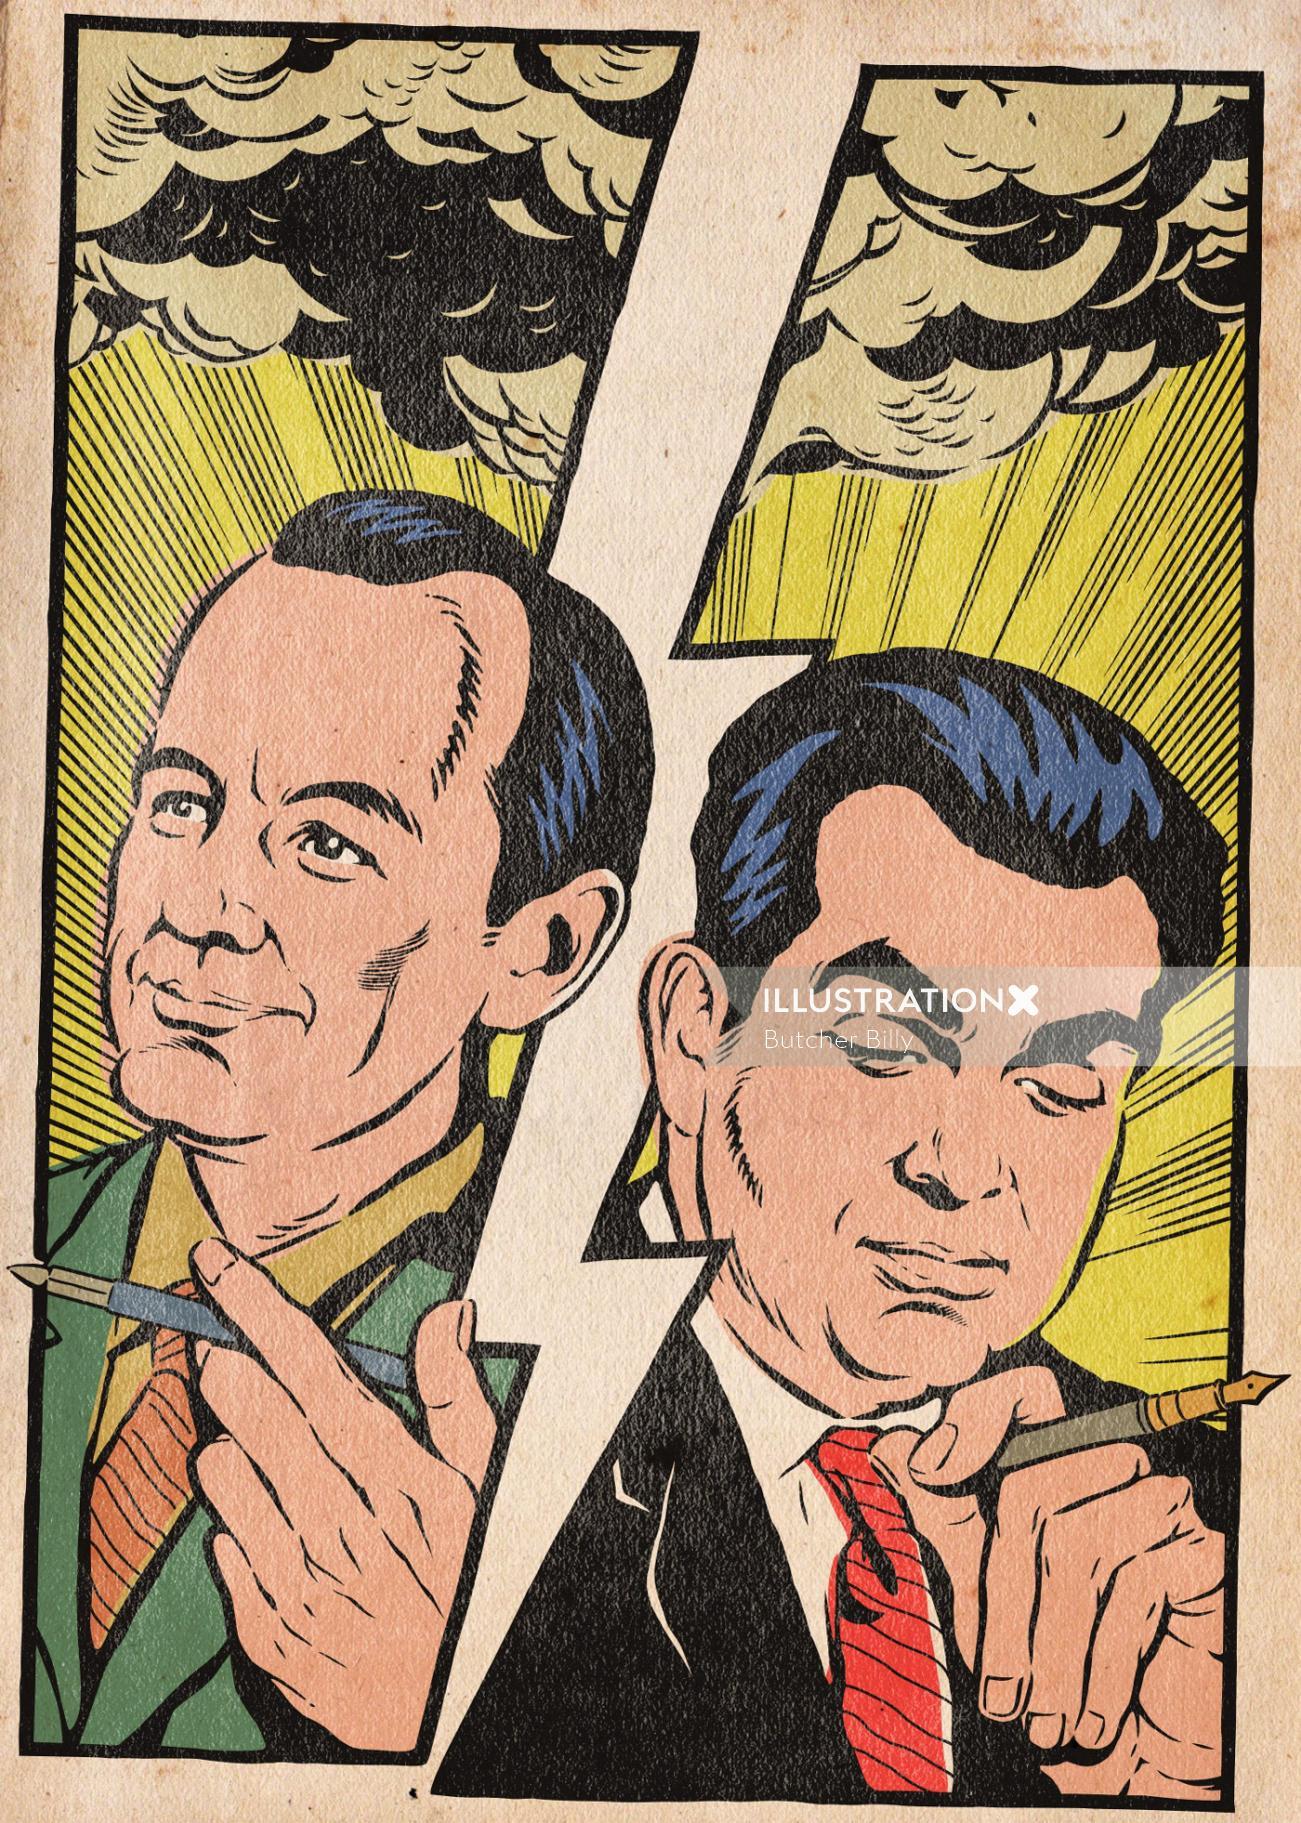 Two old men pop art poster